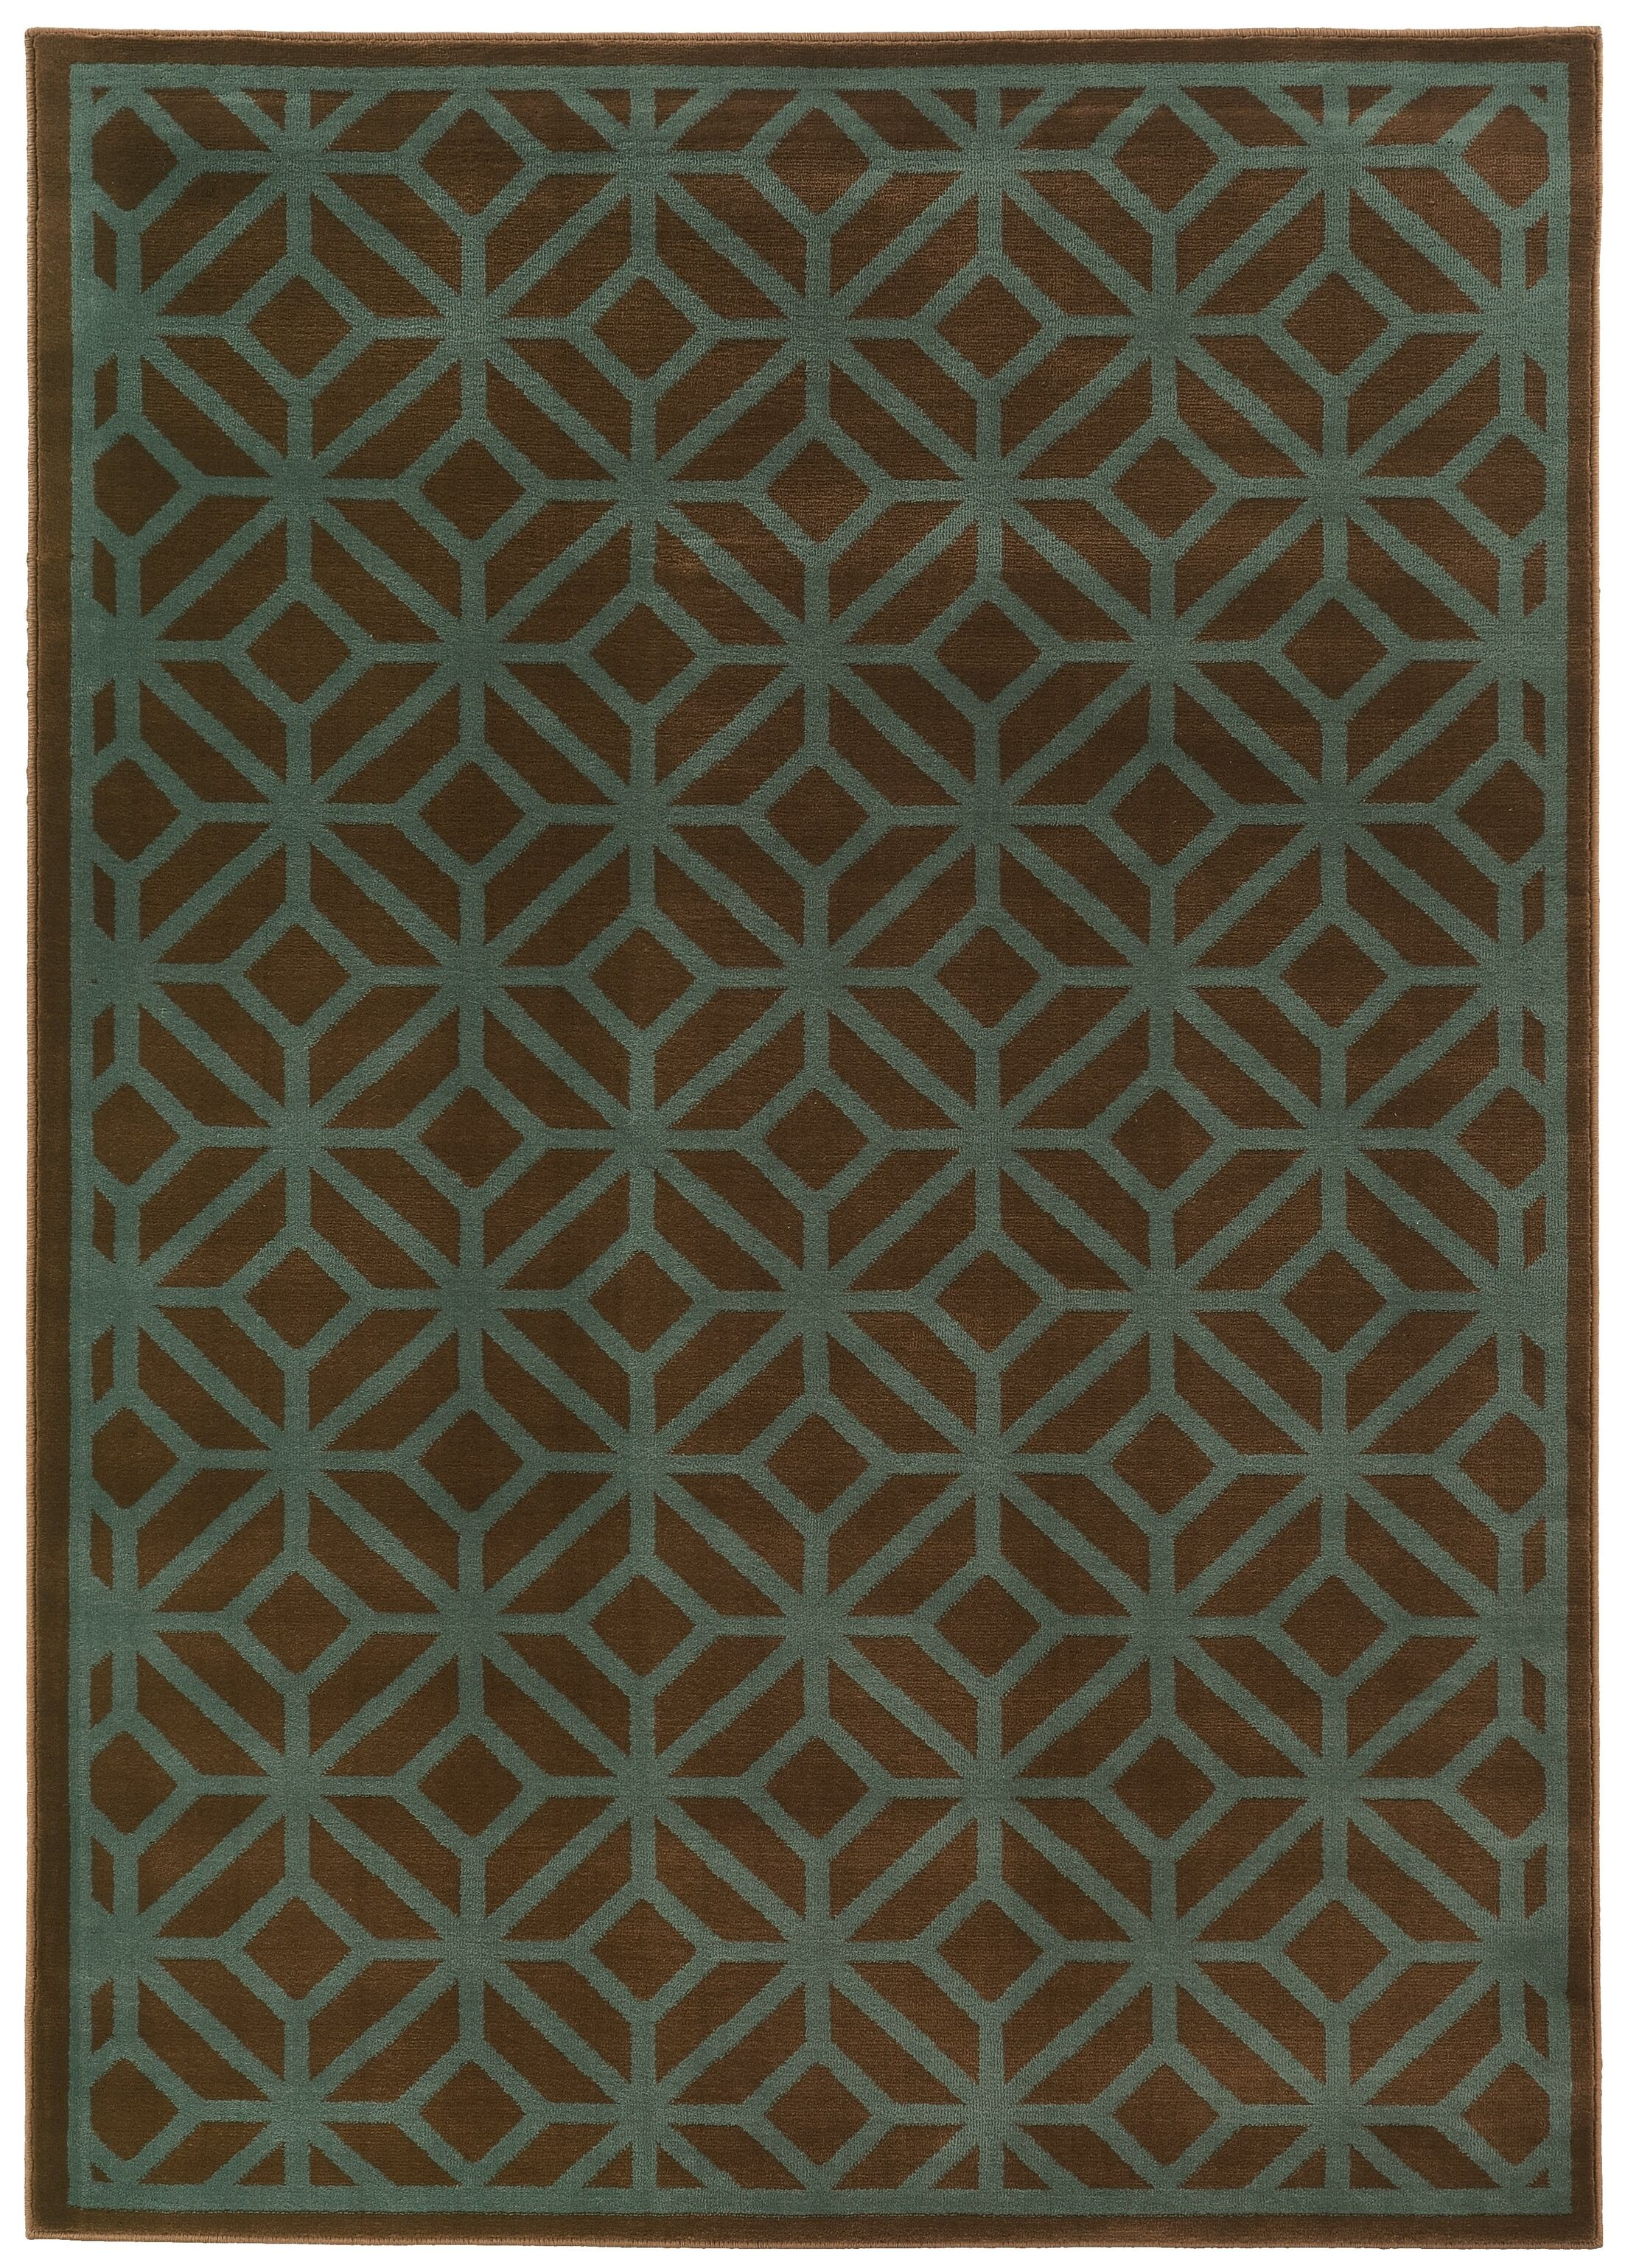 Halloran Brown/Blue Area Rug Rug Size: Rectangle 6'7